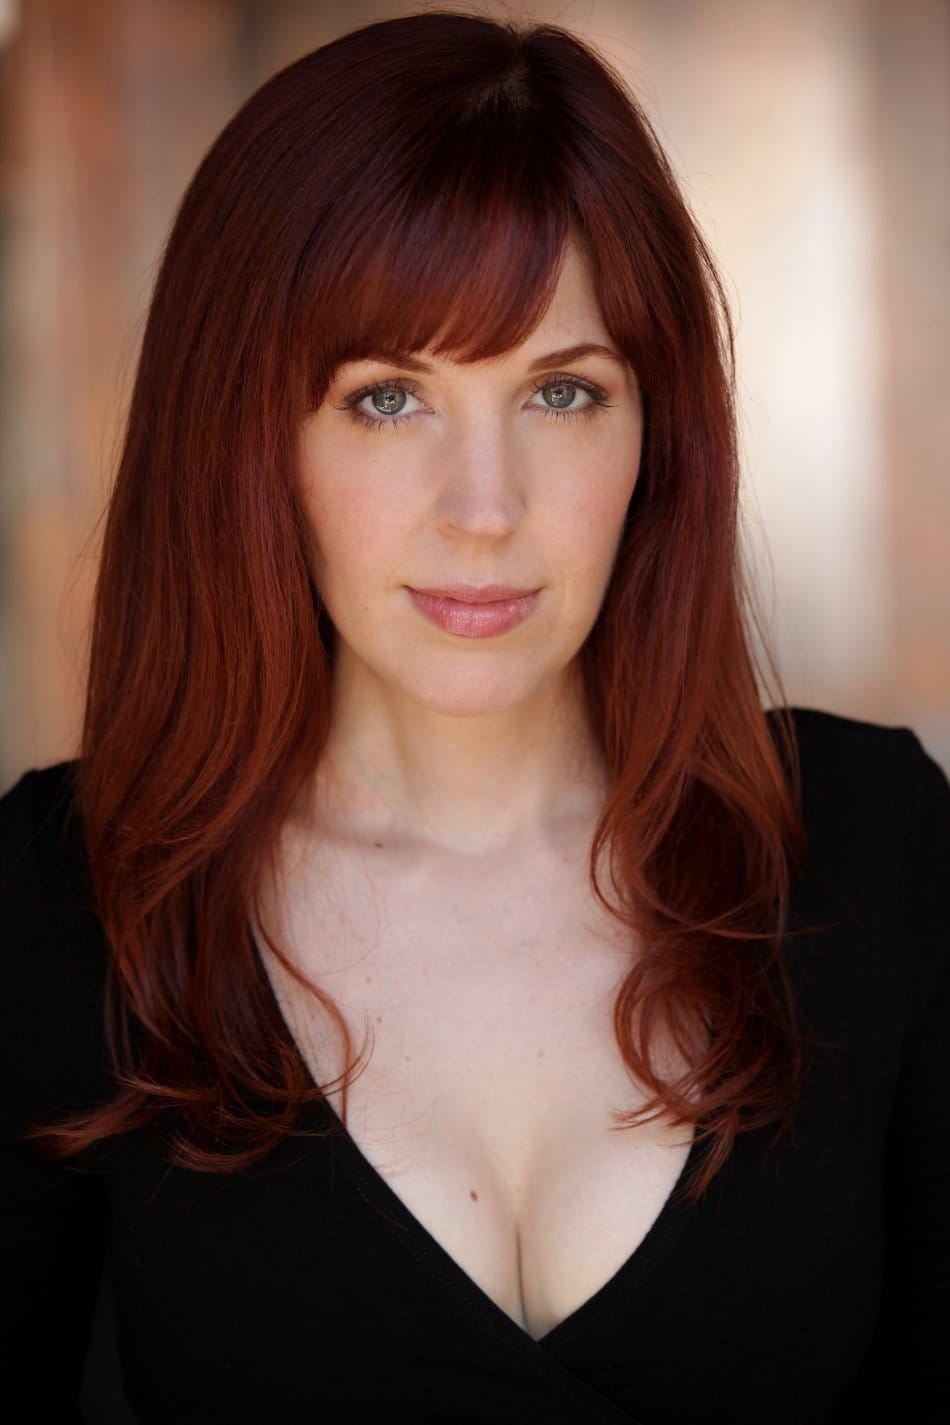 Picture of Danielle De Luca